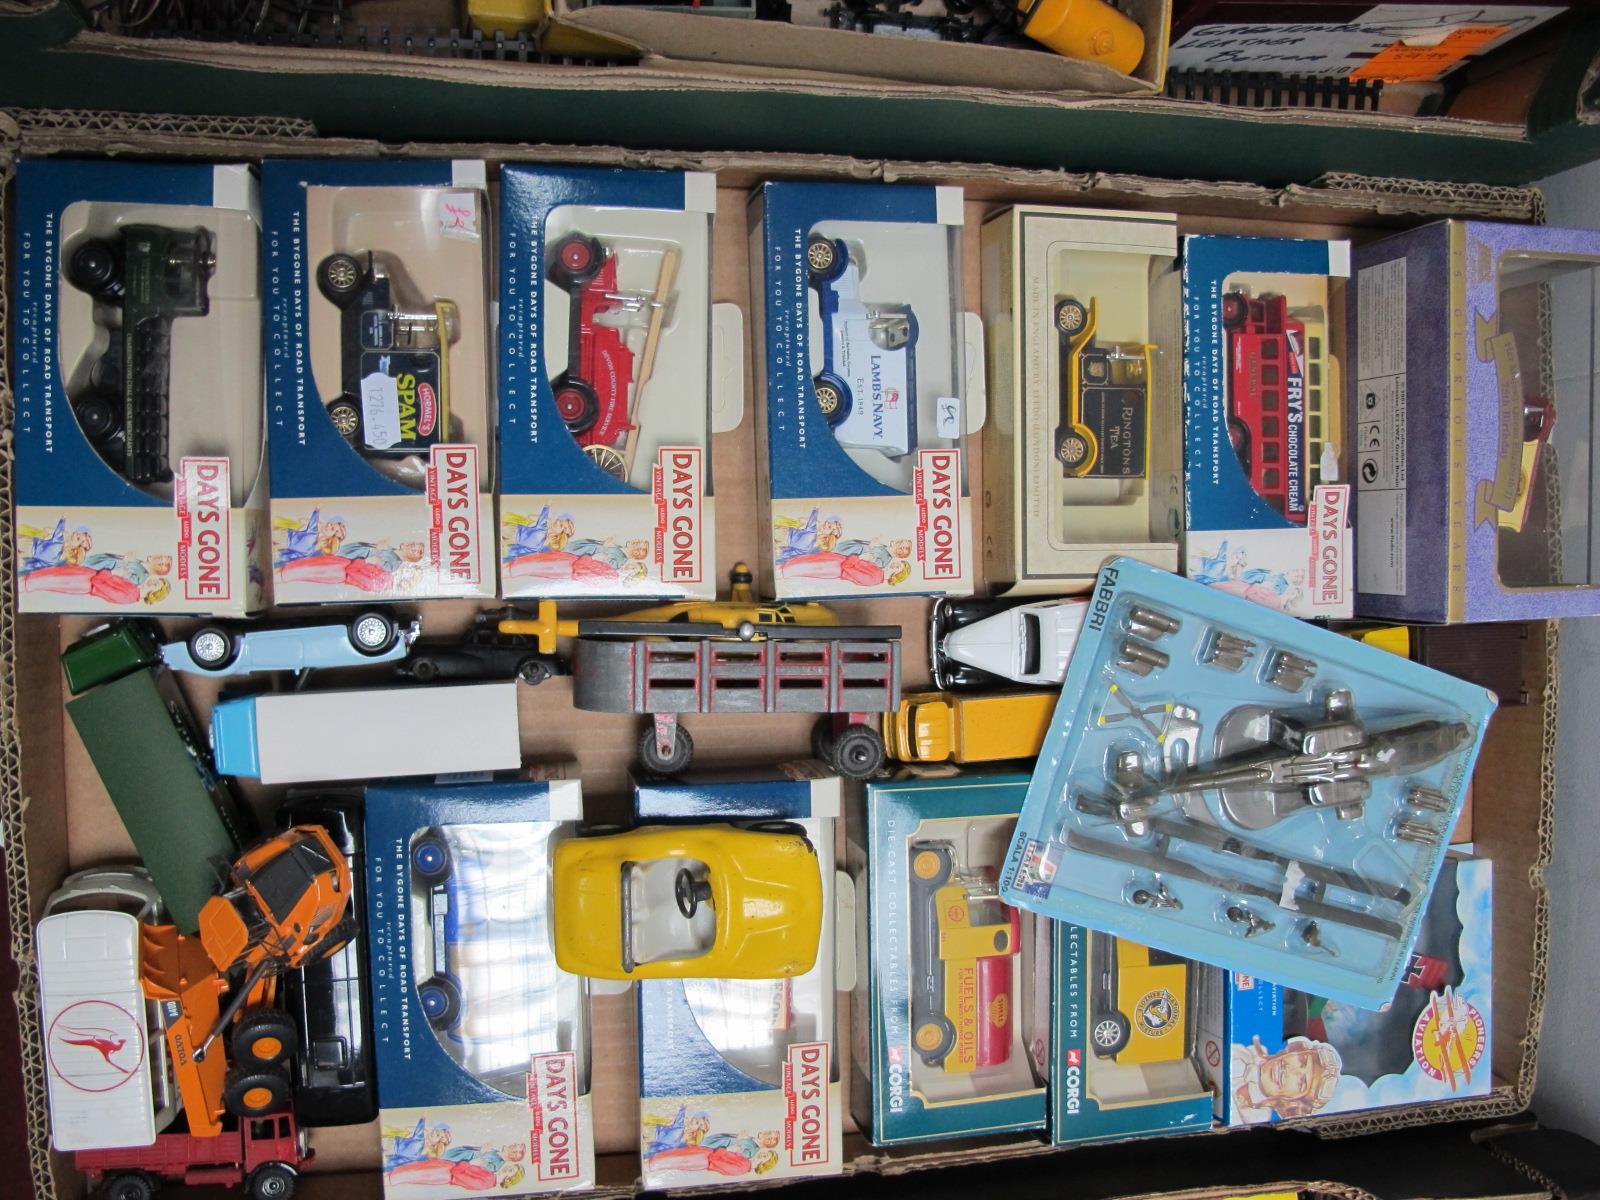 Lot 235 - A Quantity of Diecast Model Vehicles, by Lledo 'Days Gone', Tonka, ERTL, Corgi, Marx, mostly in